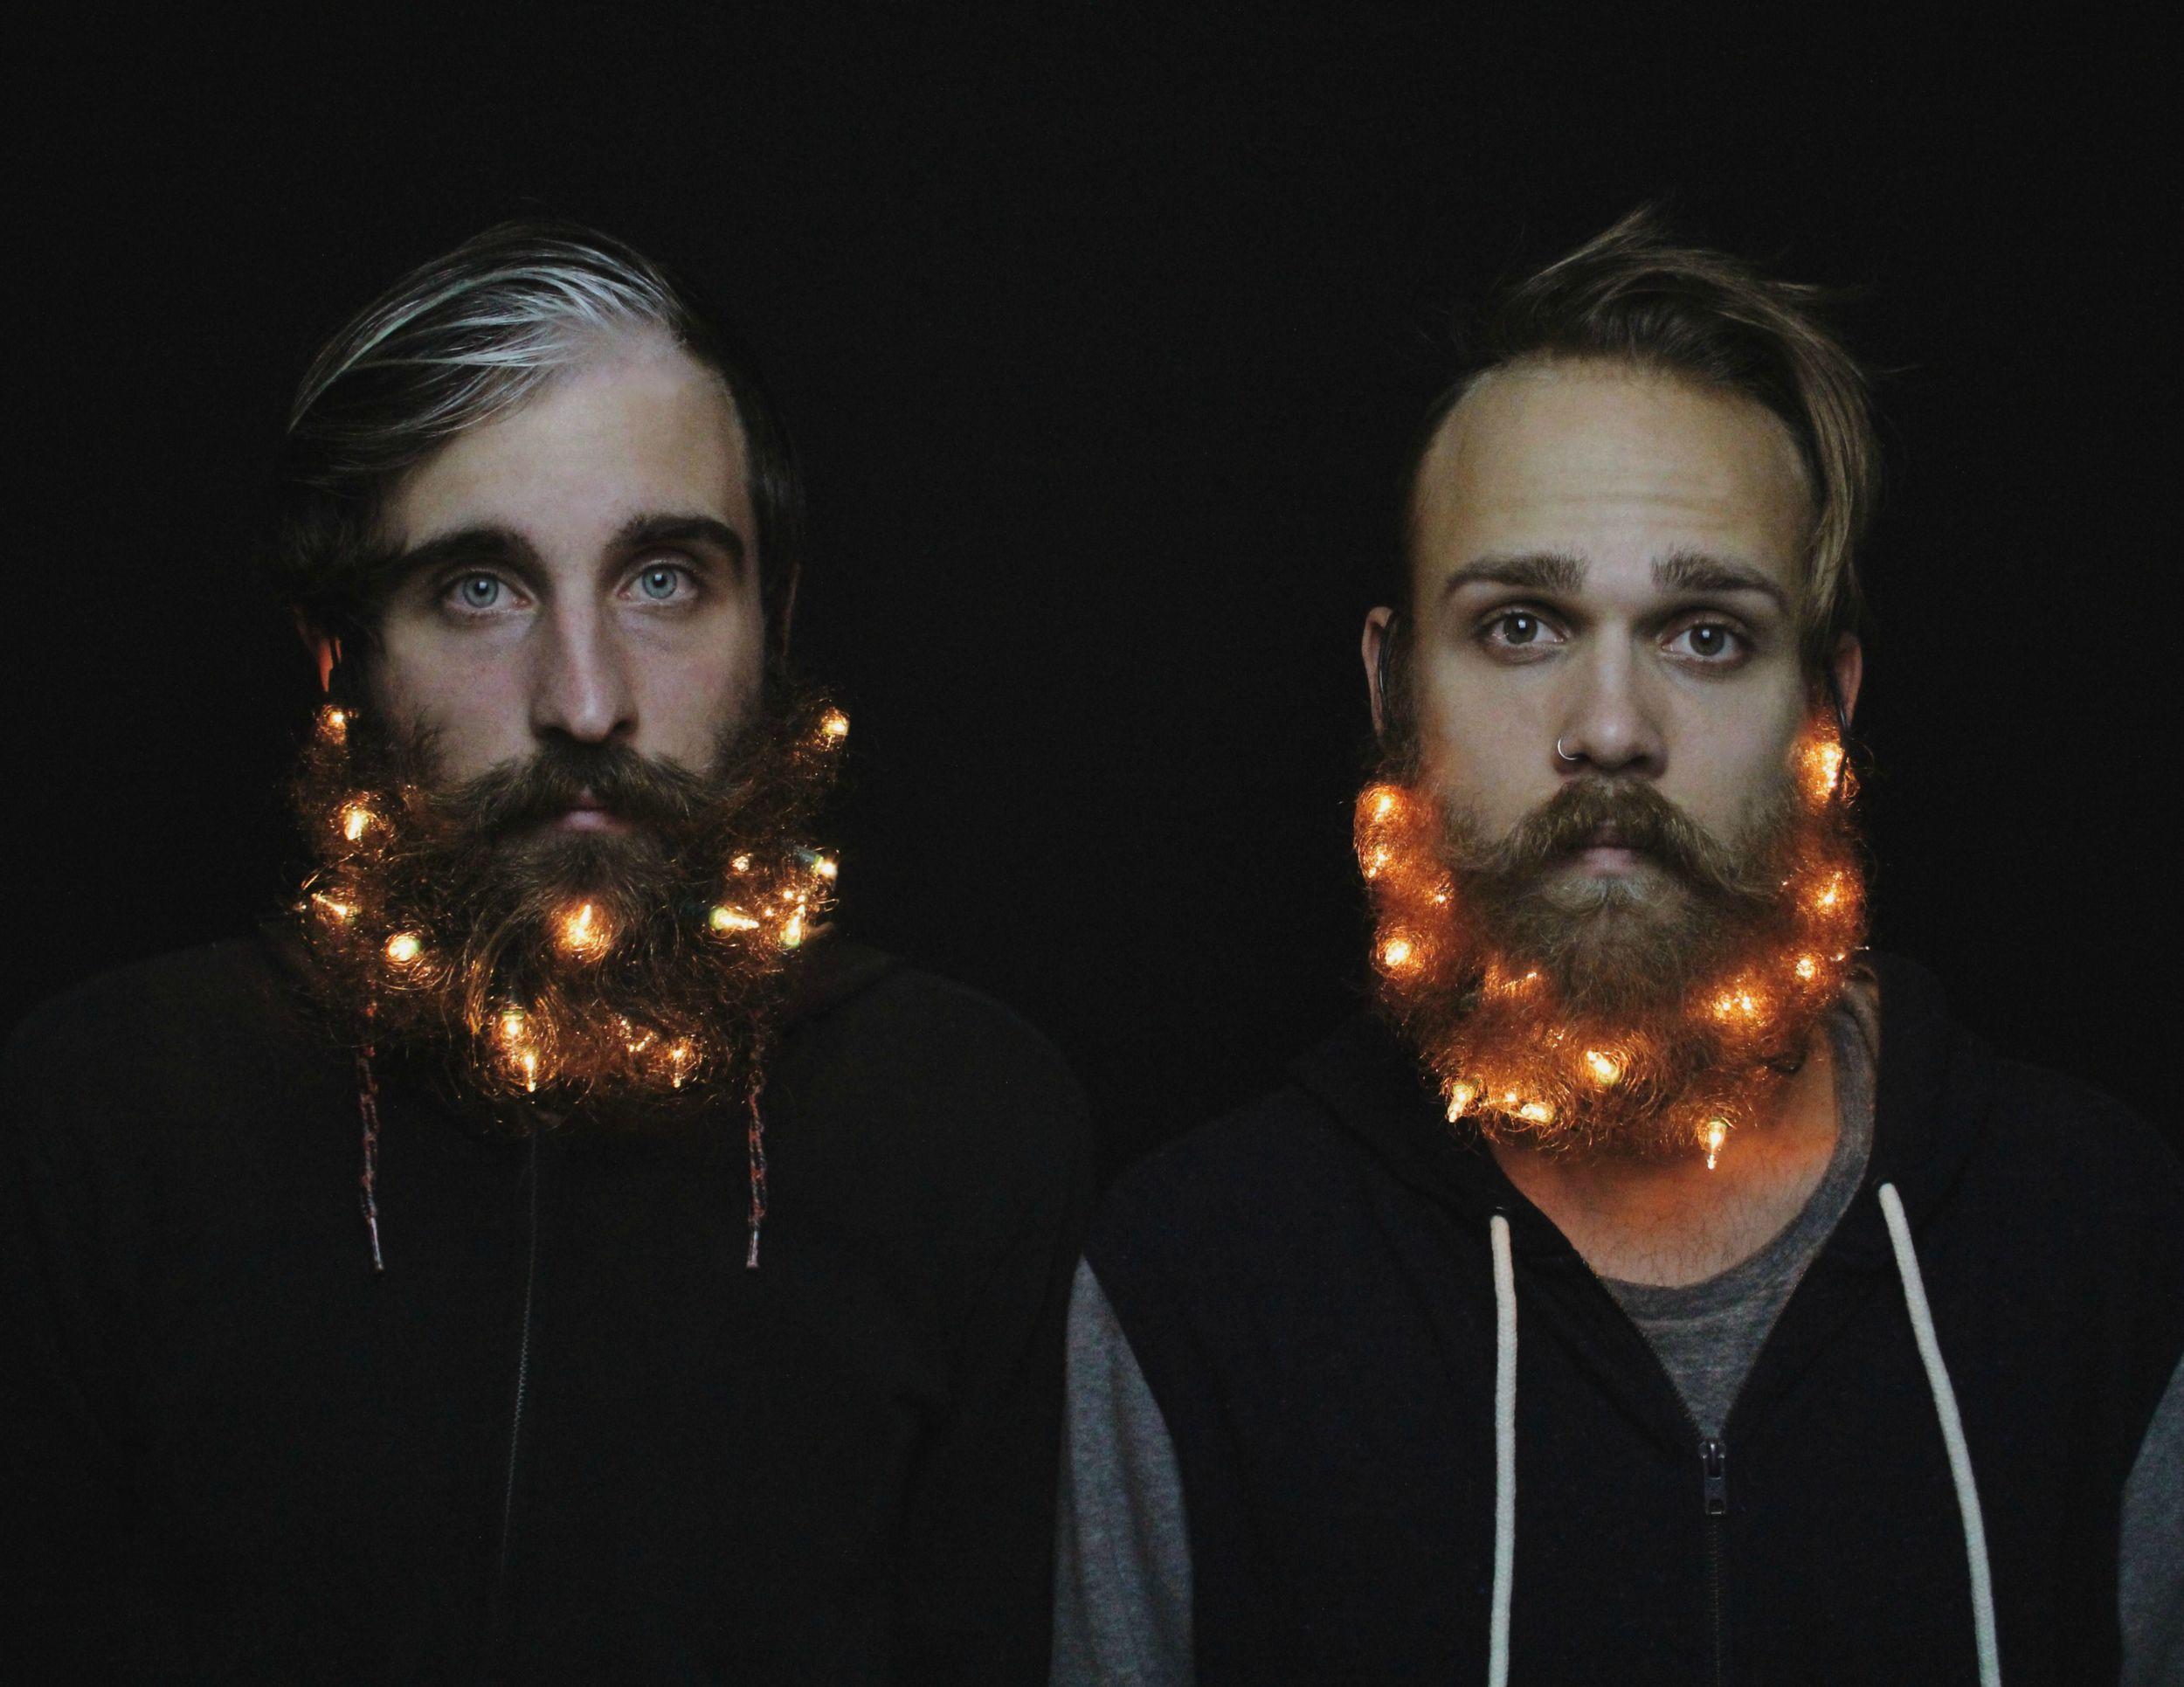 beard-holders-08.jpg